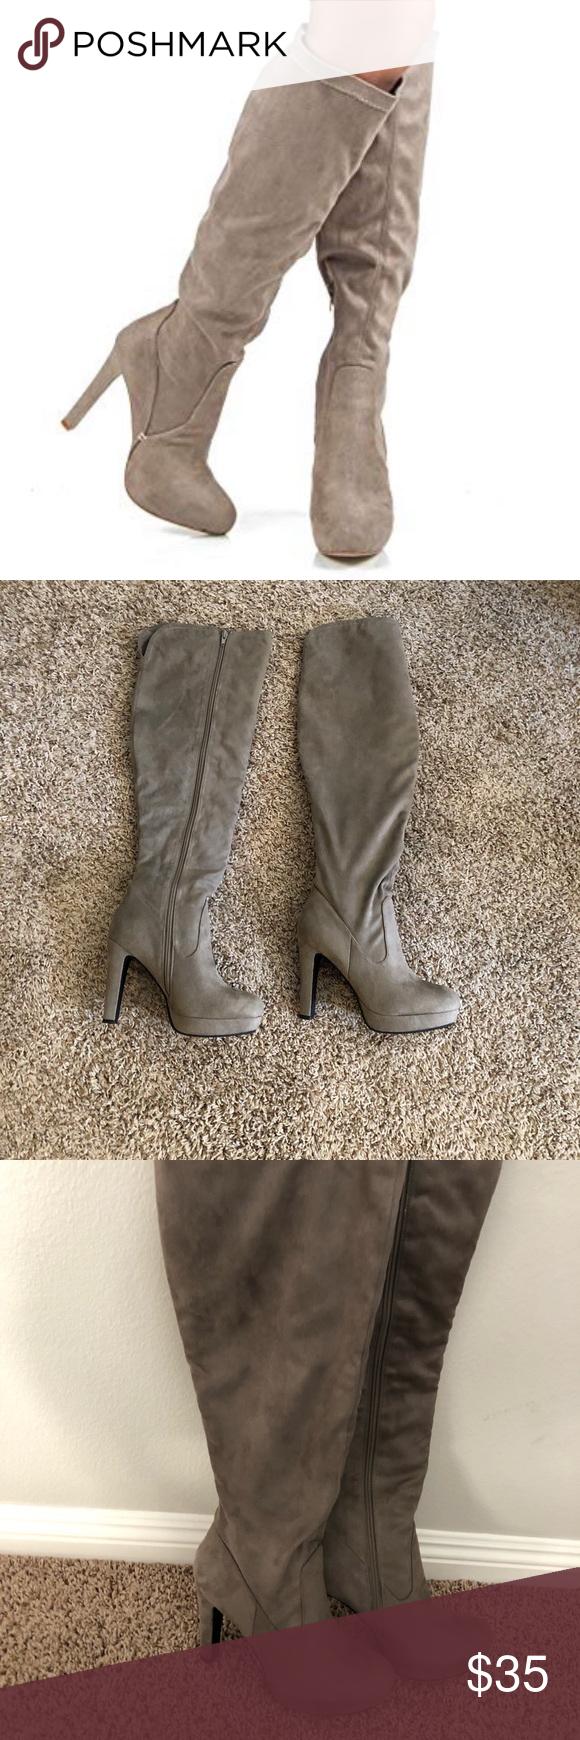 Taupe Knee High Heeled Boots Heeled boots, High heel